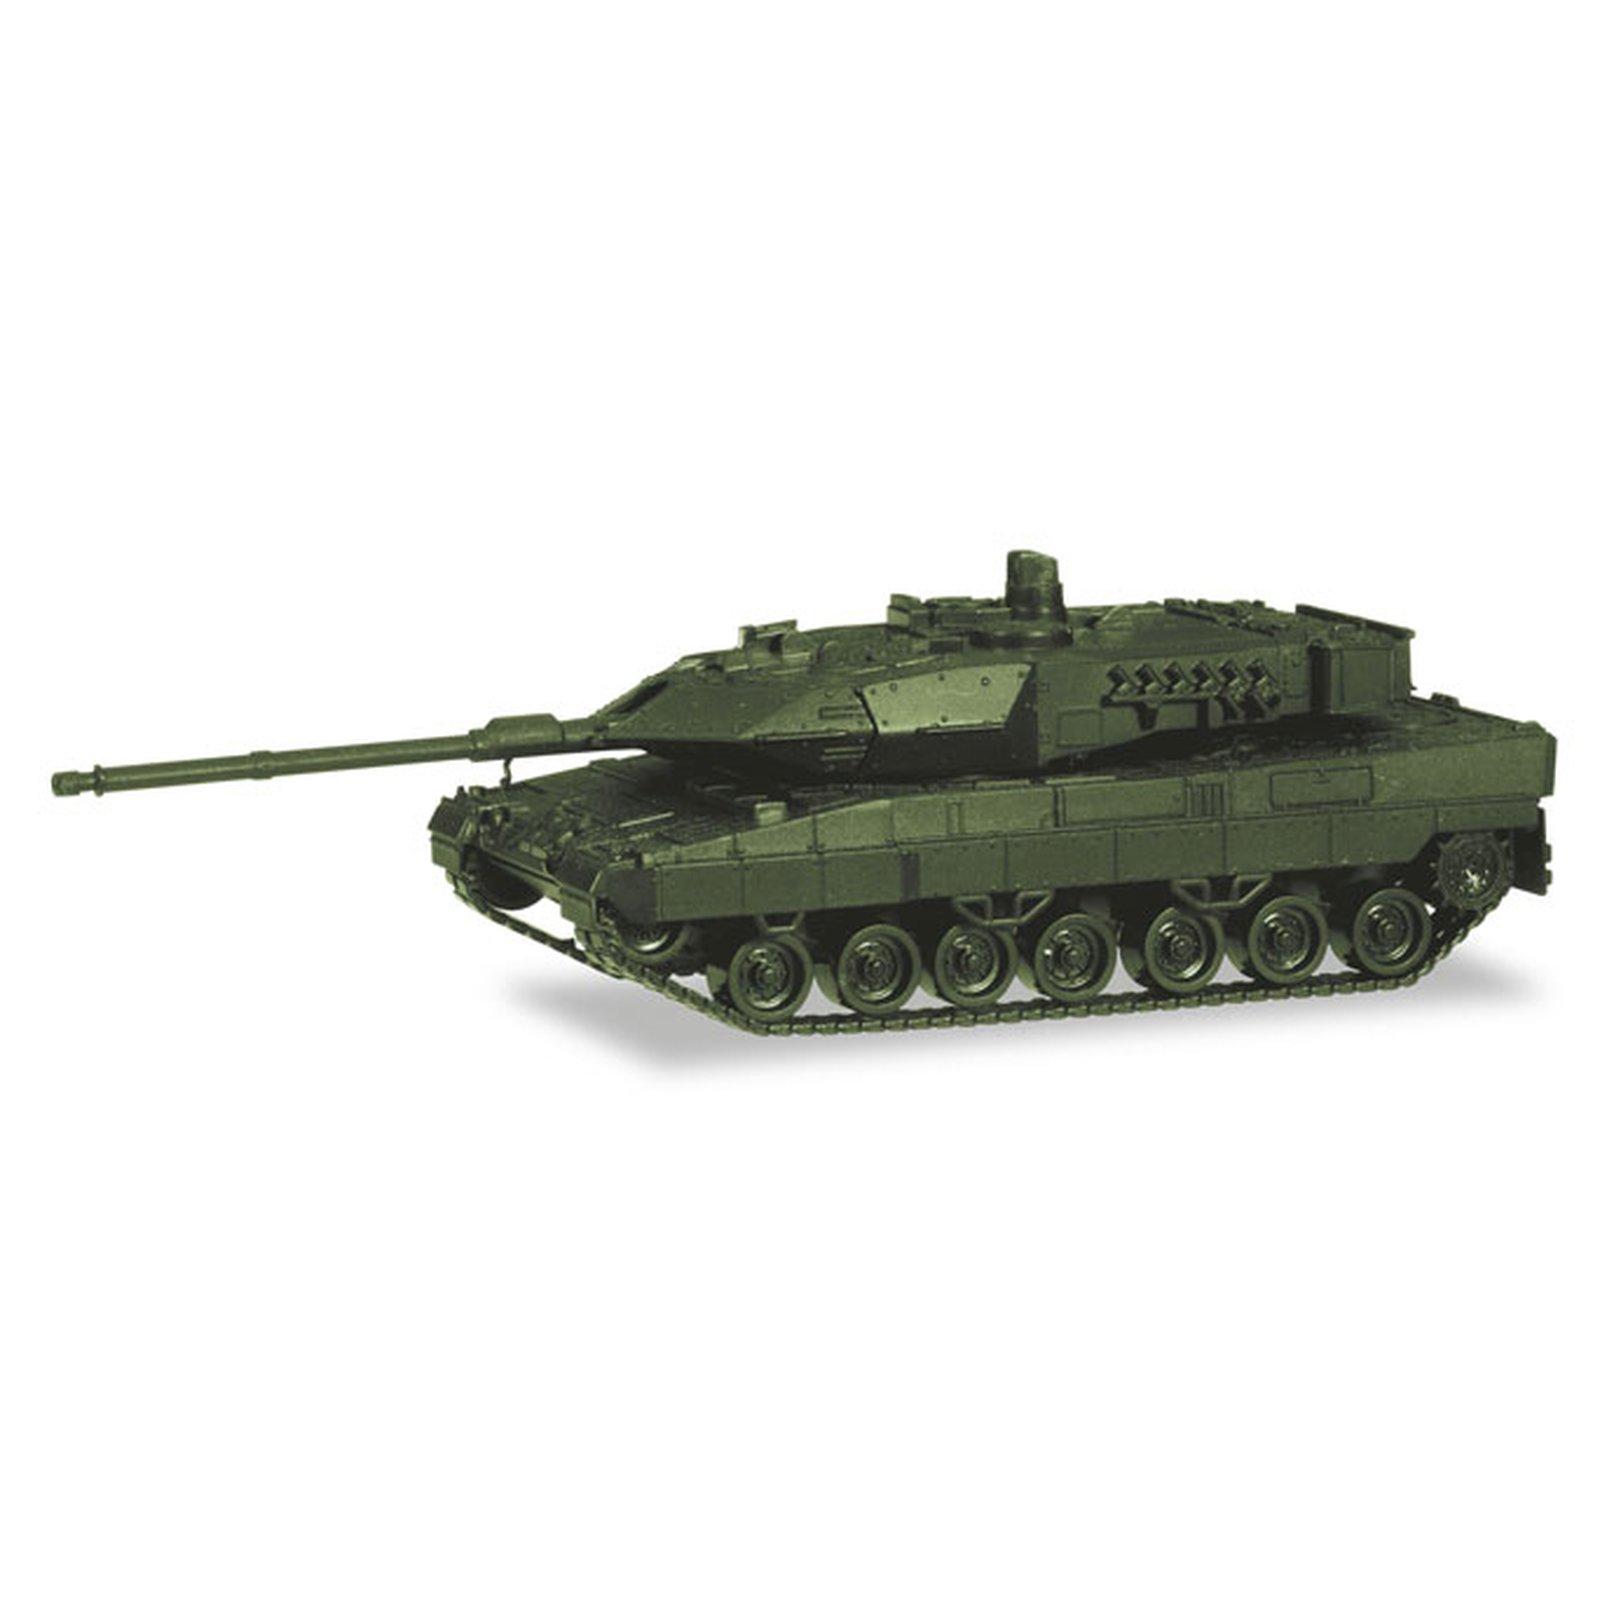 herpa 746182 kampfpanzer leopard 2a7 undekoriert ma stab. Black Bedroom Furniture Sets. Home Design Ideas